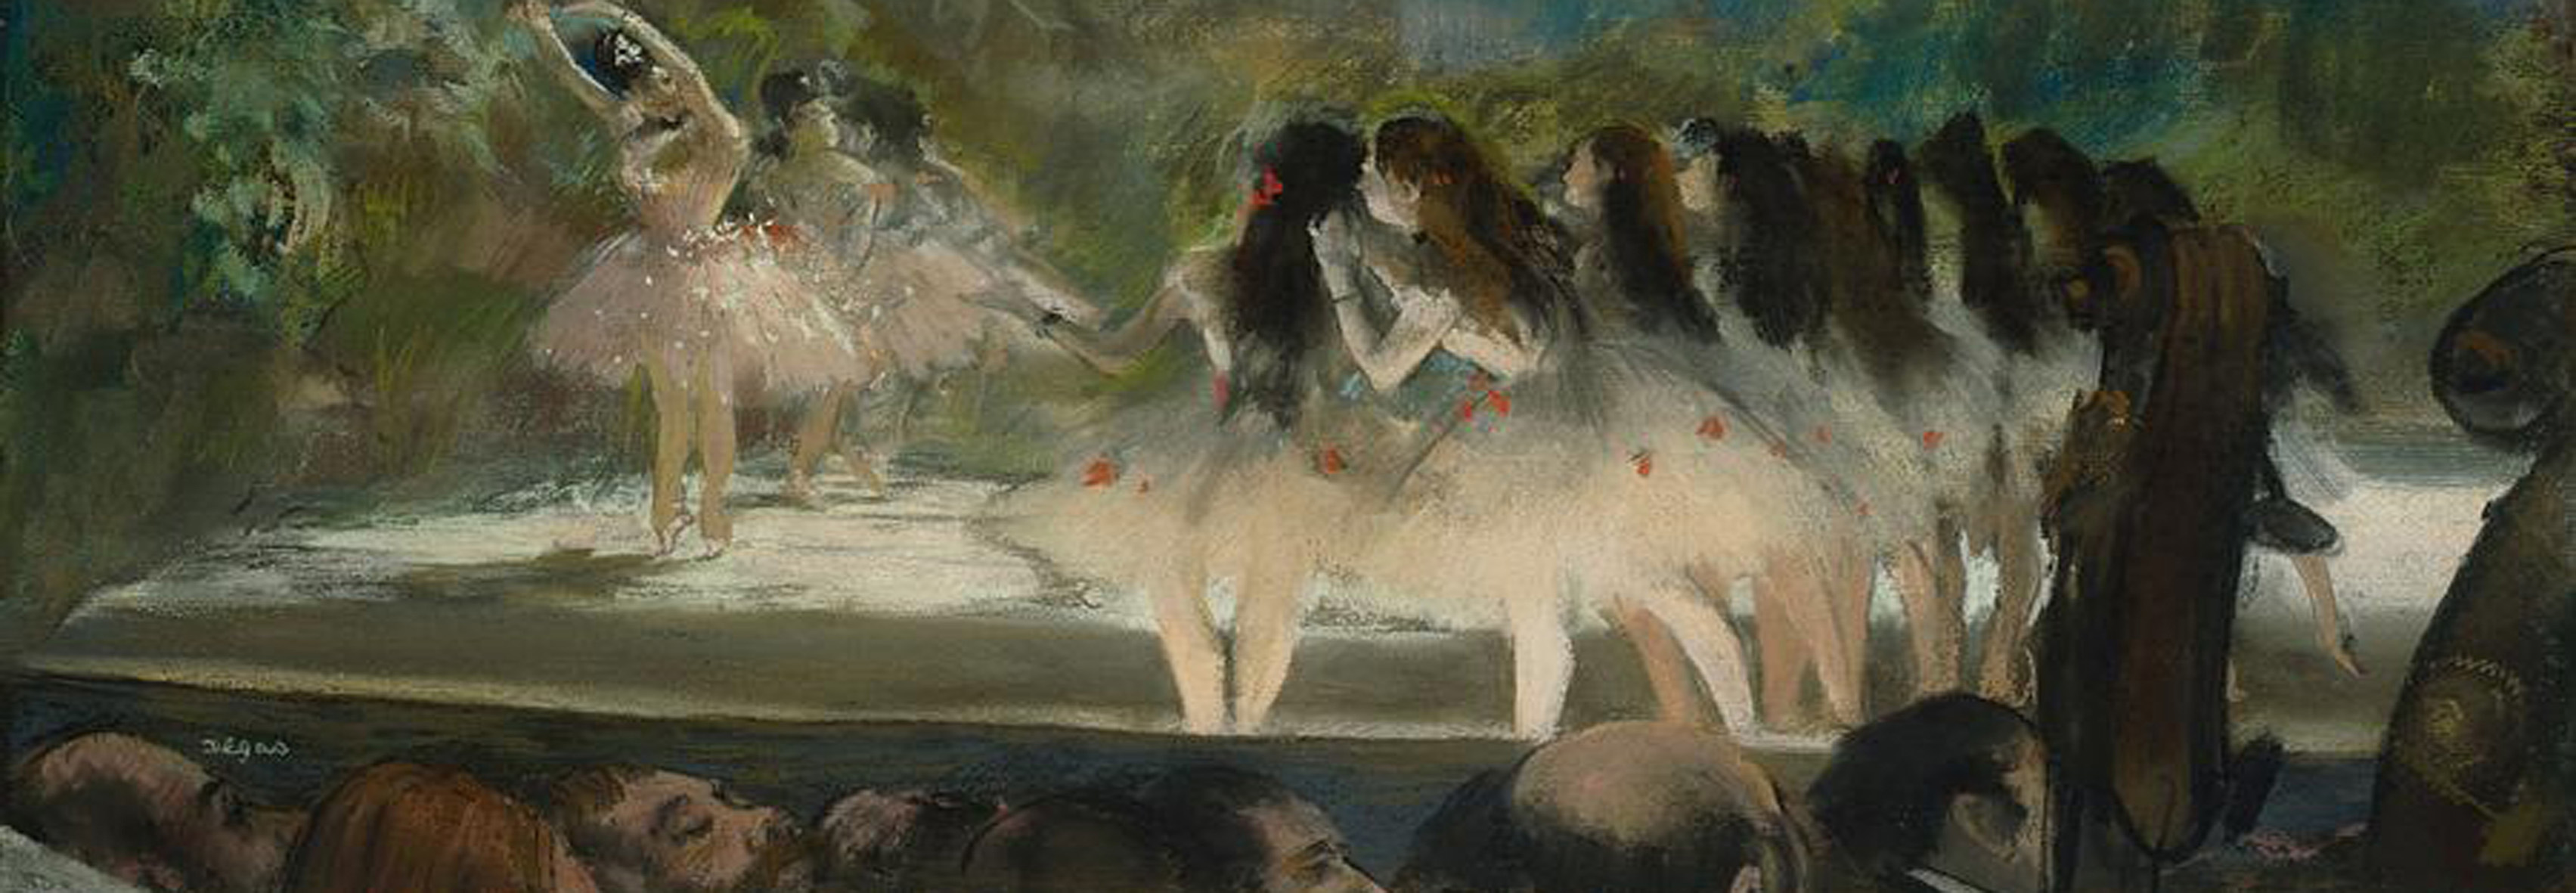 3002N00015 - Degas, Edgar -Ballet at the